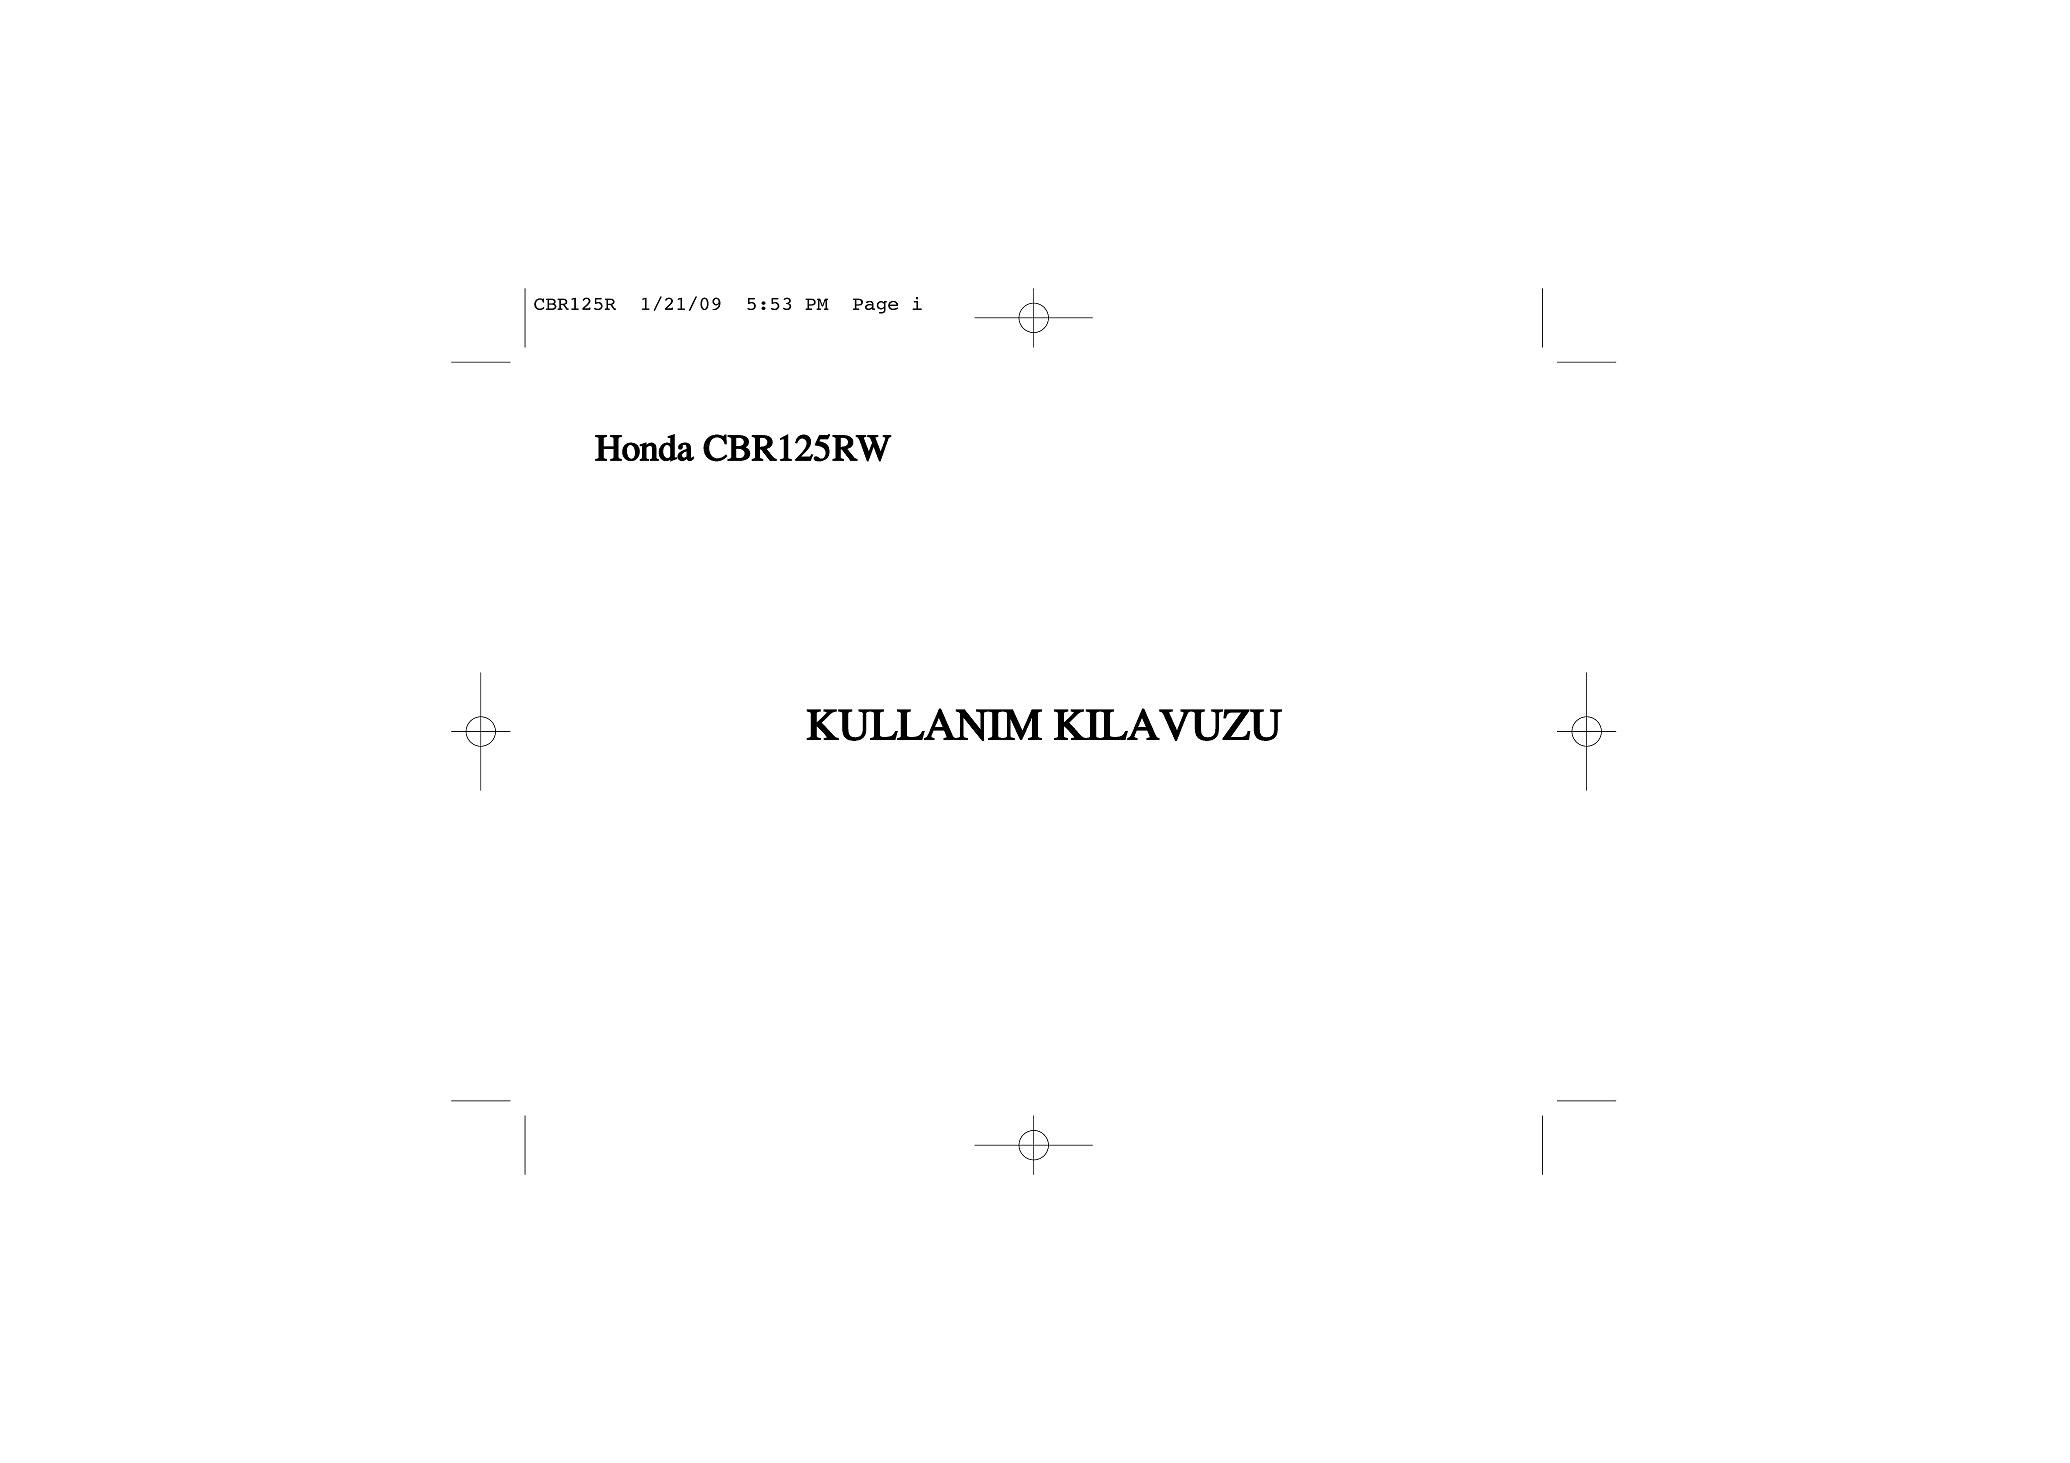 Owners manual for Honda CBR125RW (Turkish) (2009)